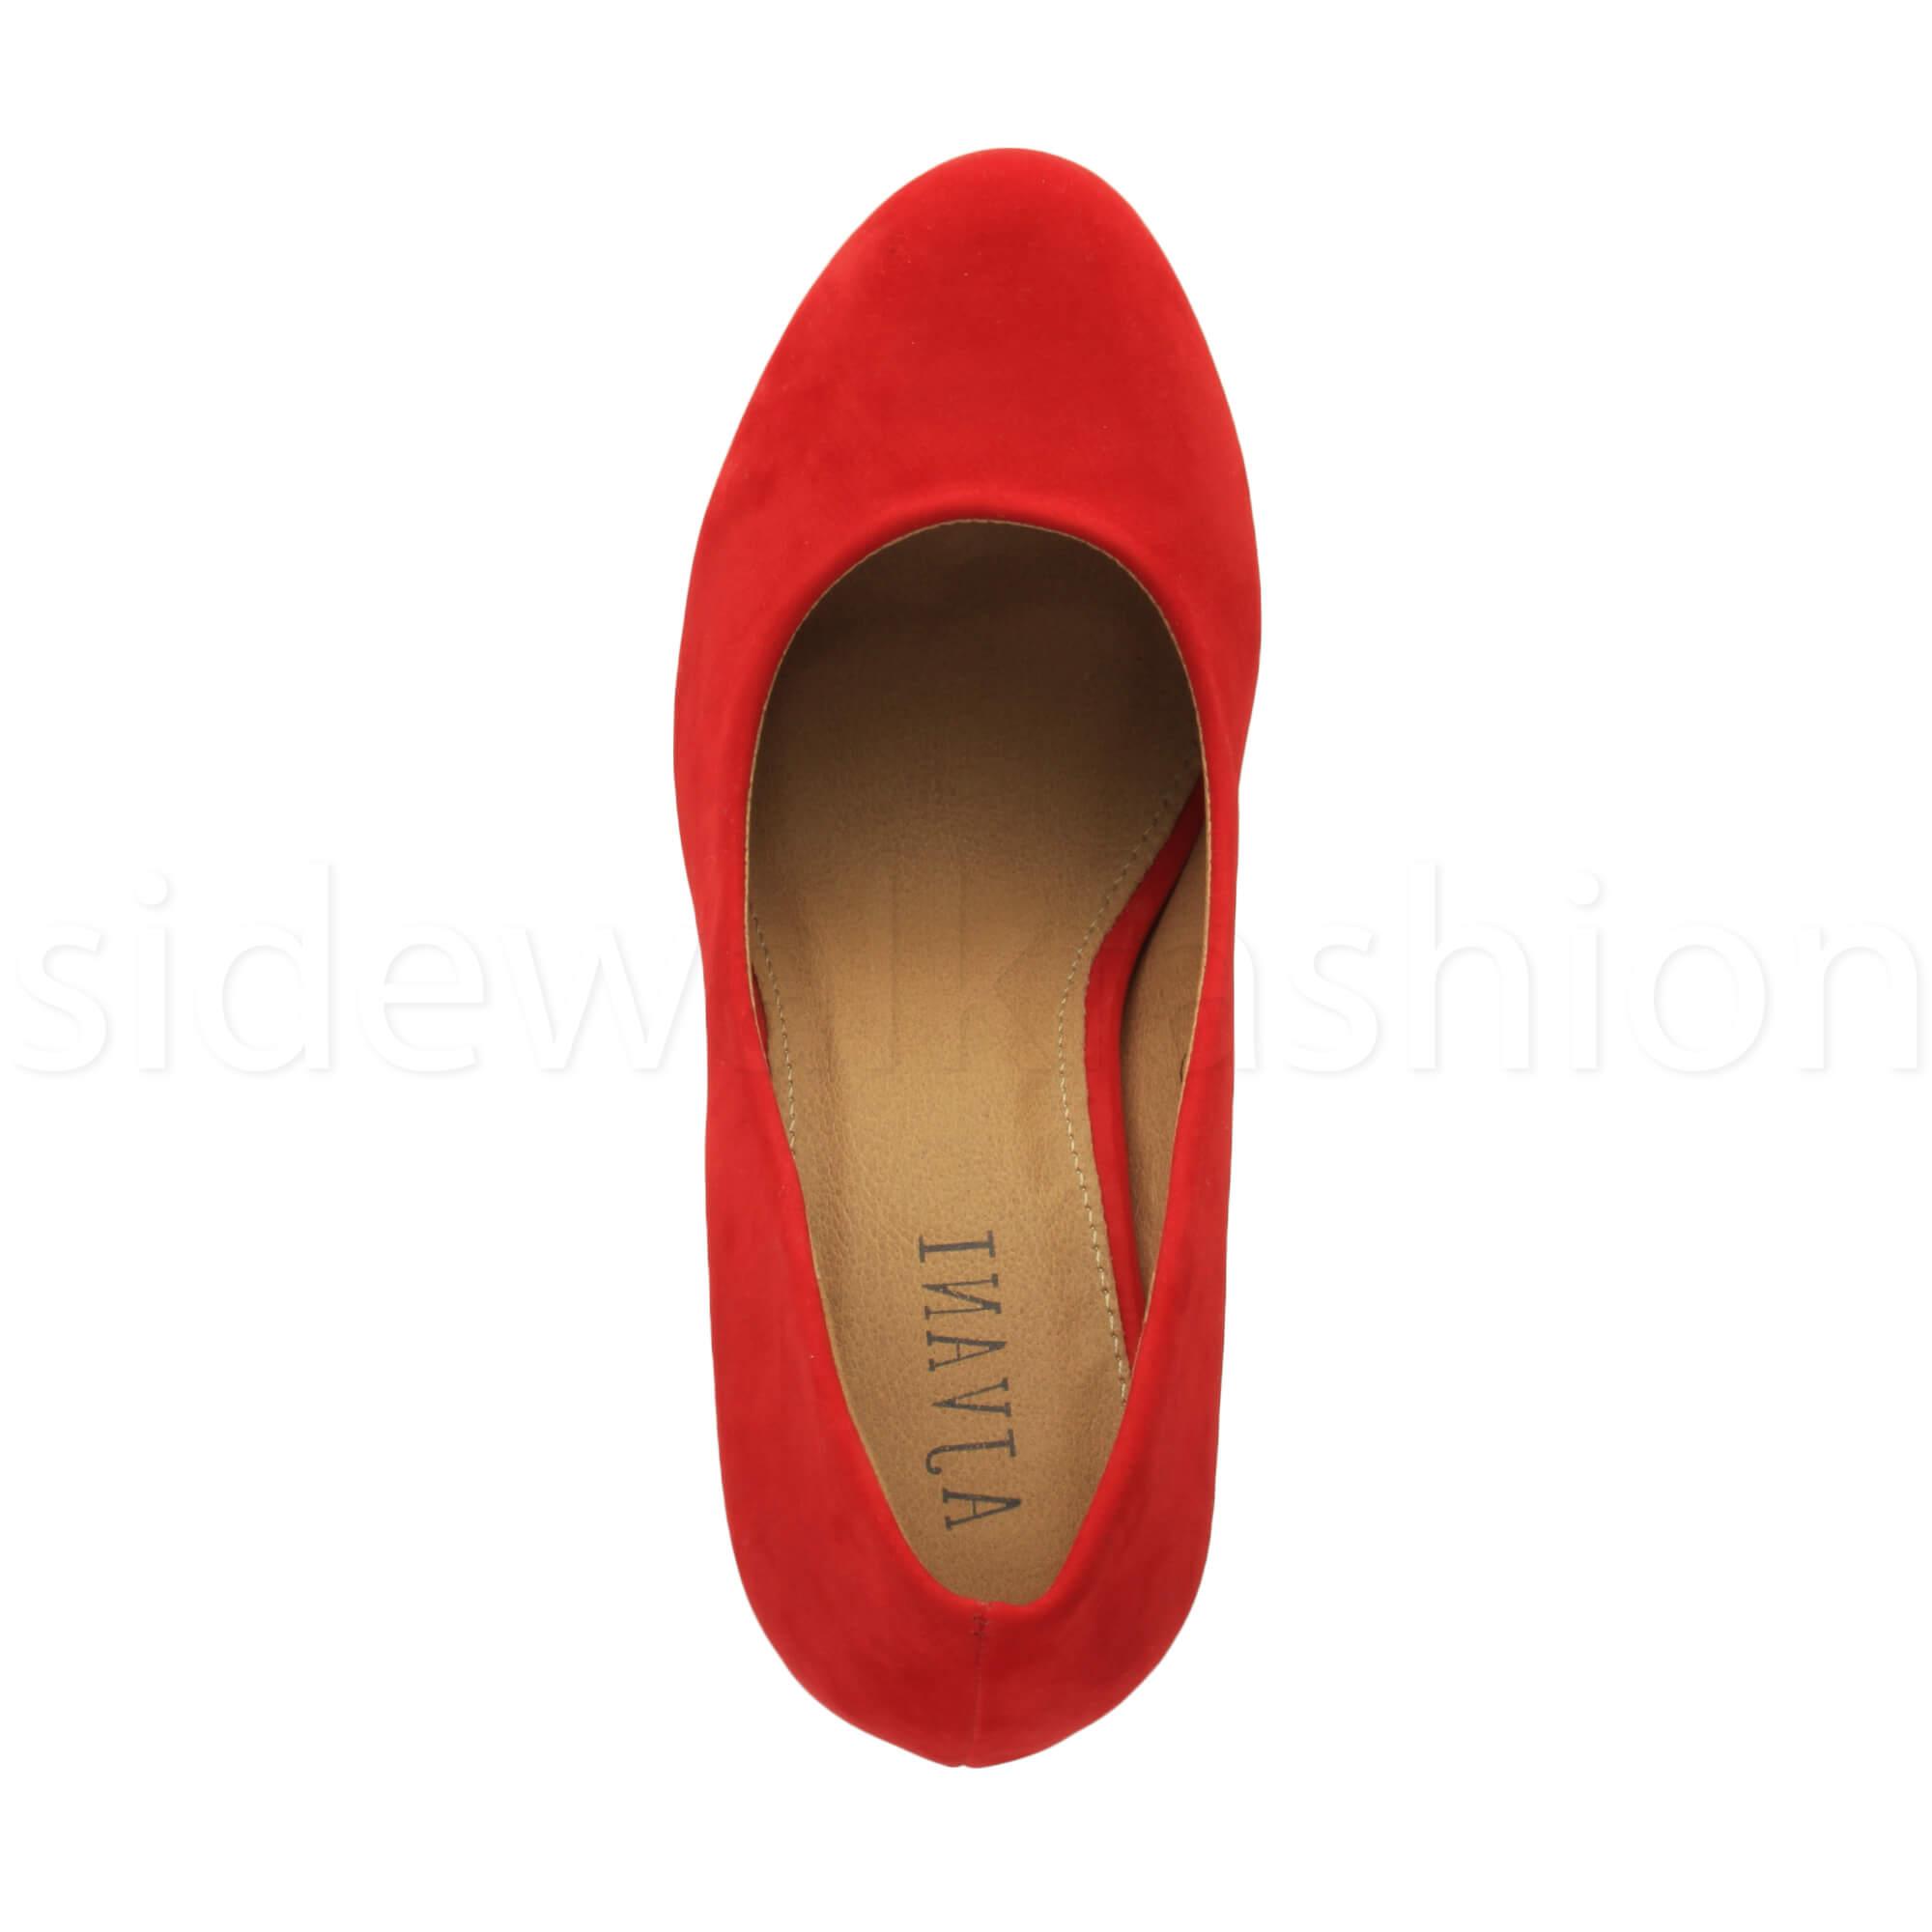 Womens-ladies-high-mid-heel-platform-wedding-evening-bridesmaid-court-shoes-size thumbnail 154